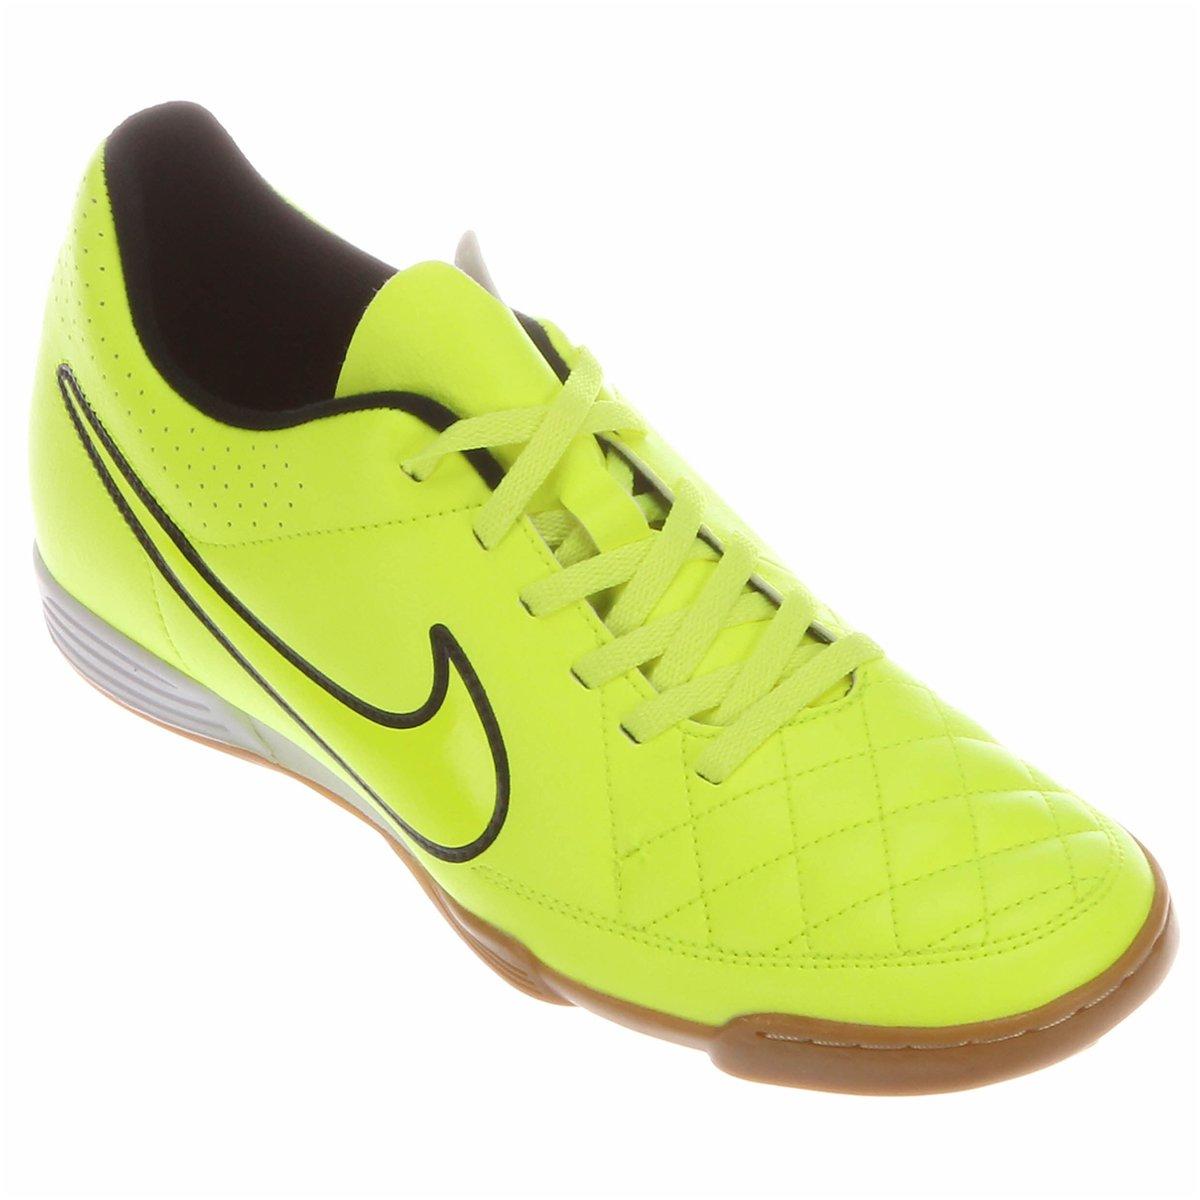 Chuteira Nike Tiempo Rio 2 IC Futsal - Compre Agora  c031c0d1a7f06